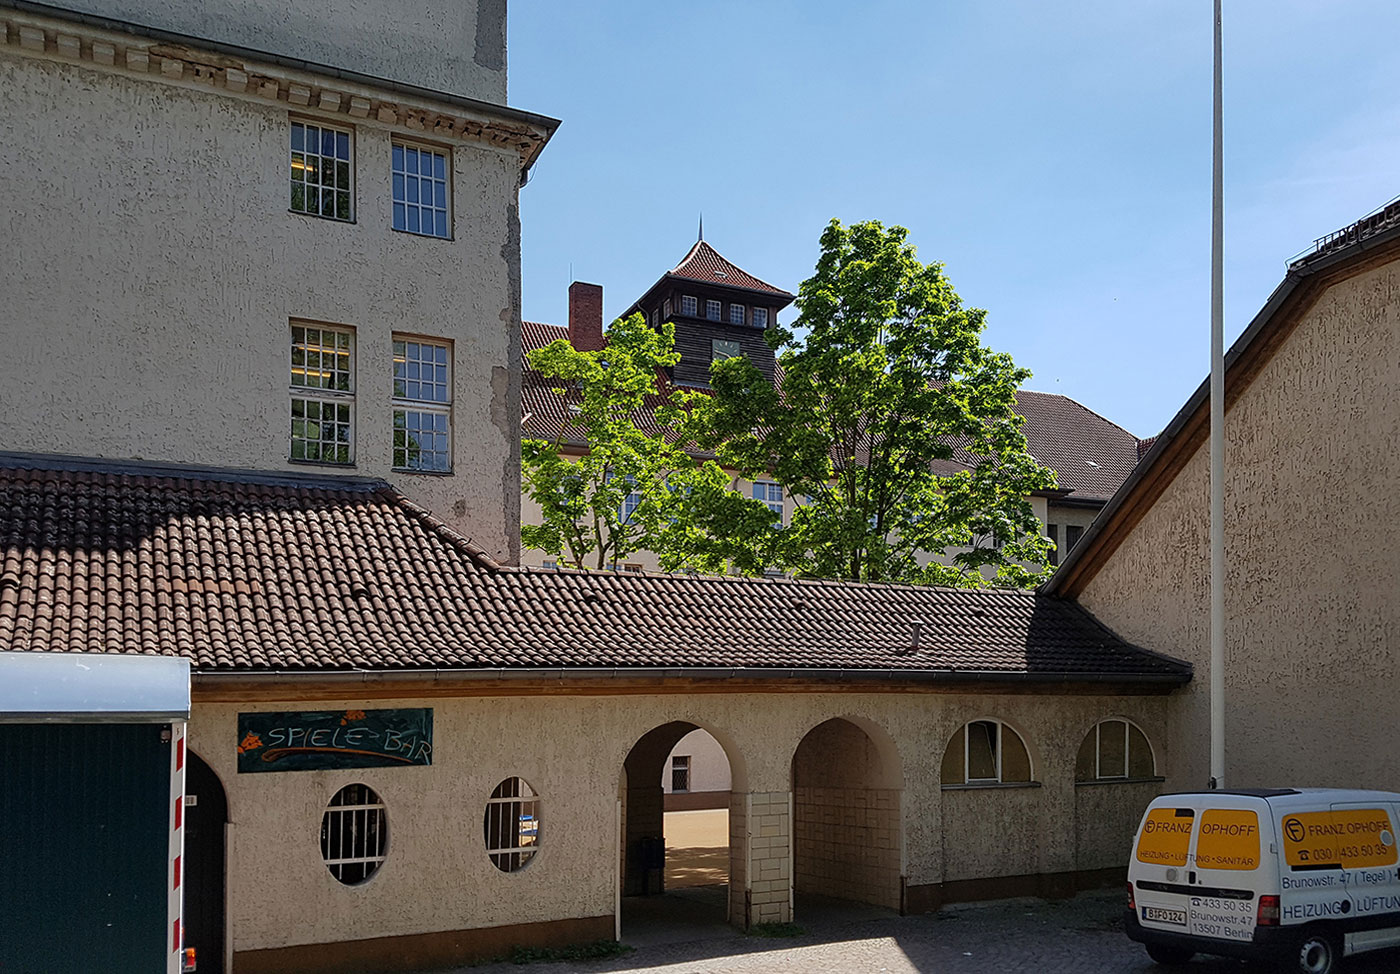 Schulen Berlin-Reinickendorf - Strangsanierung